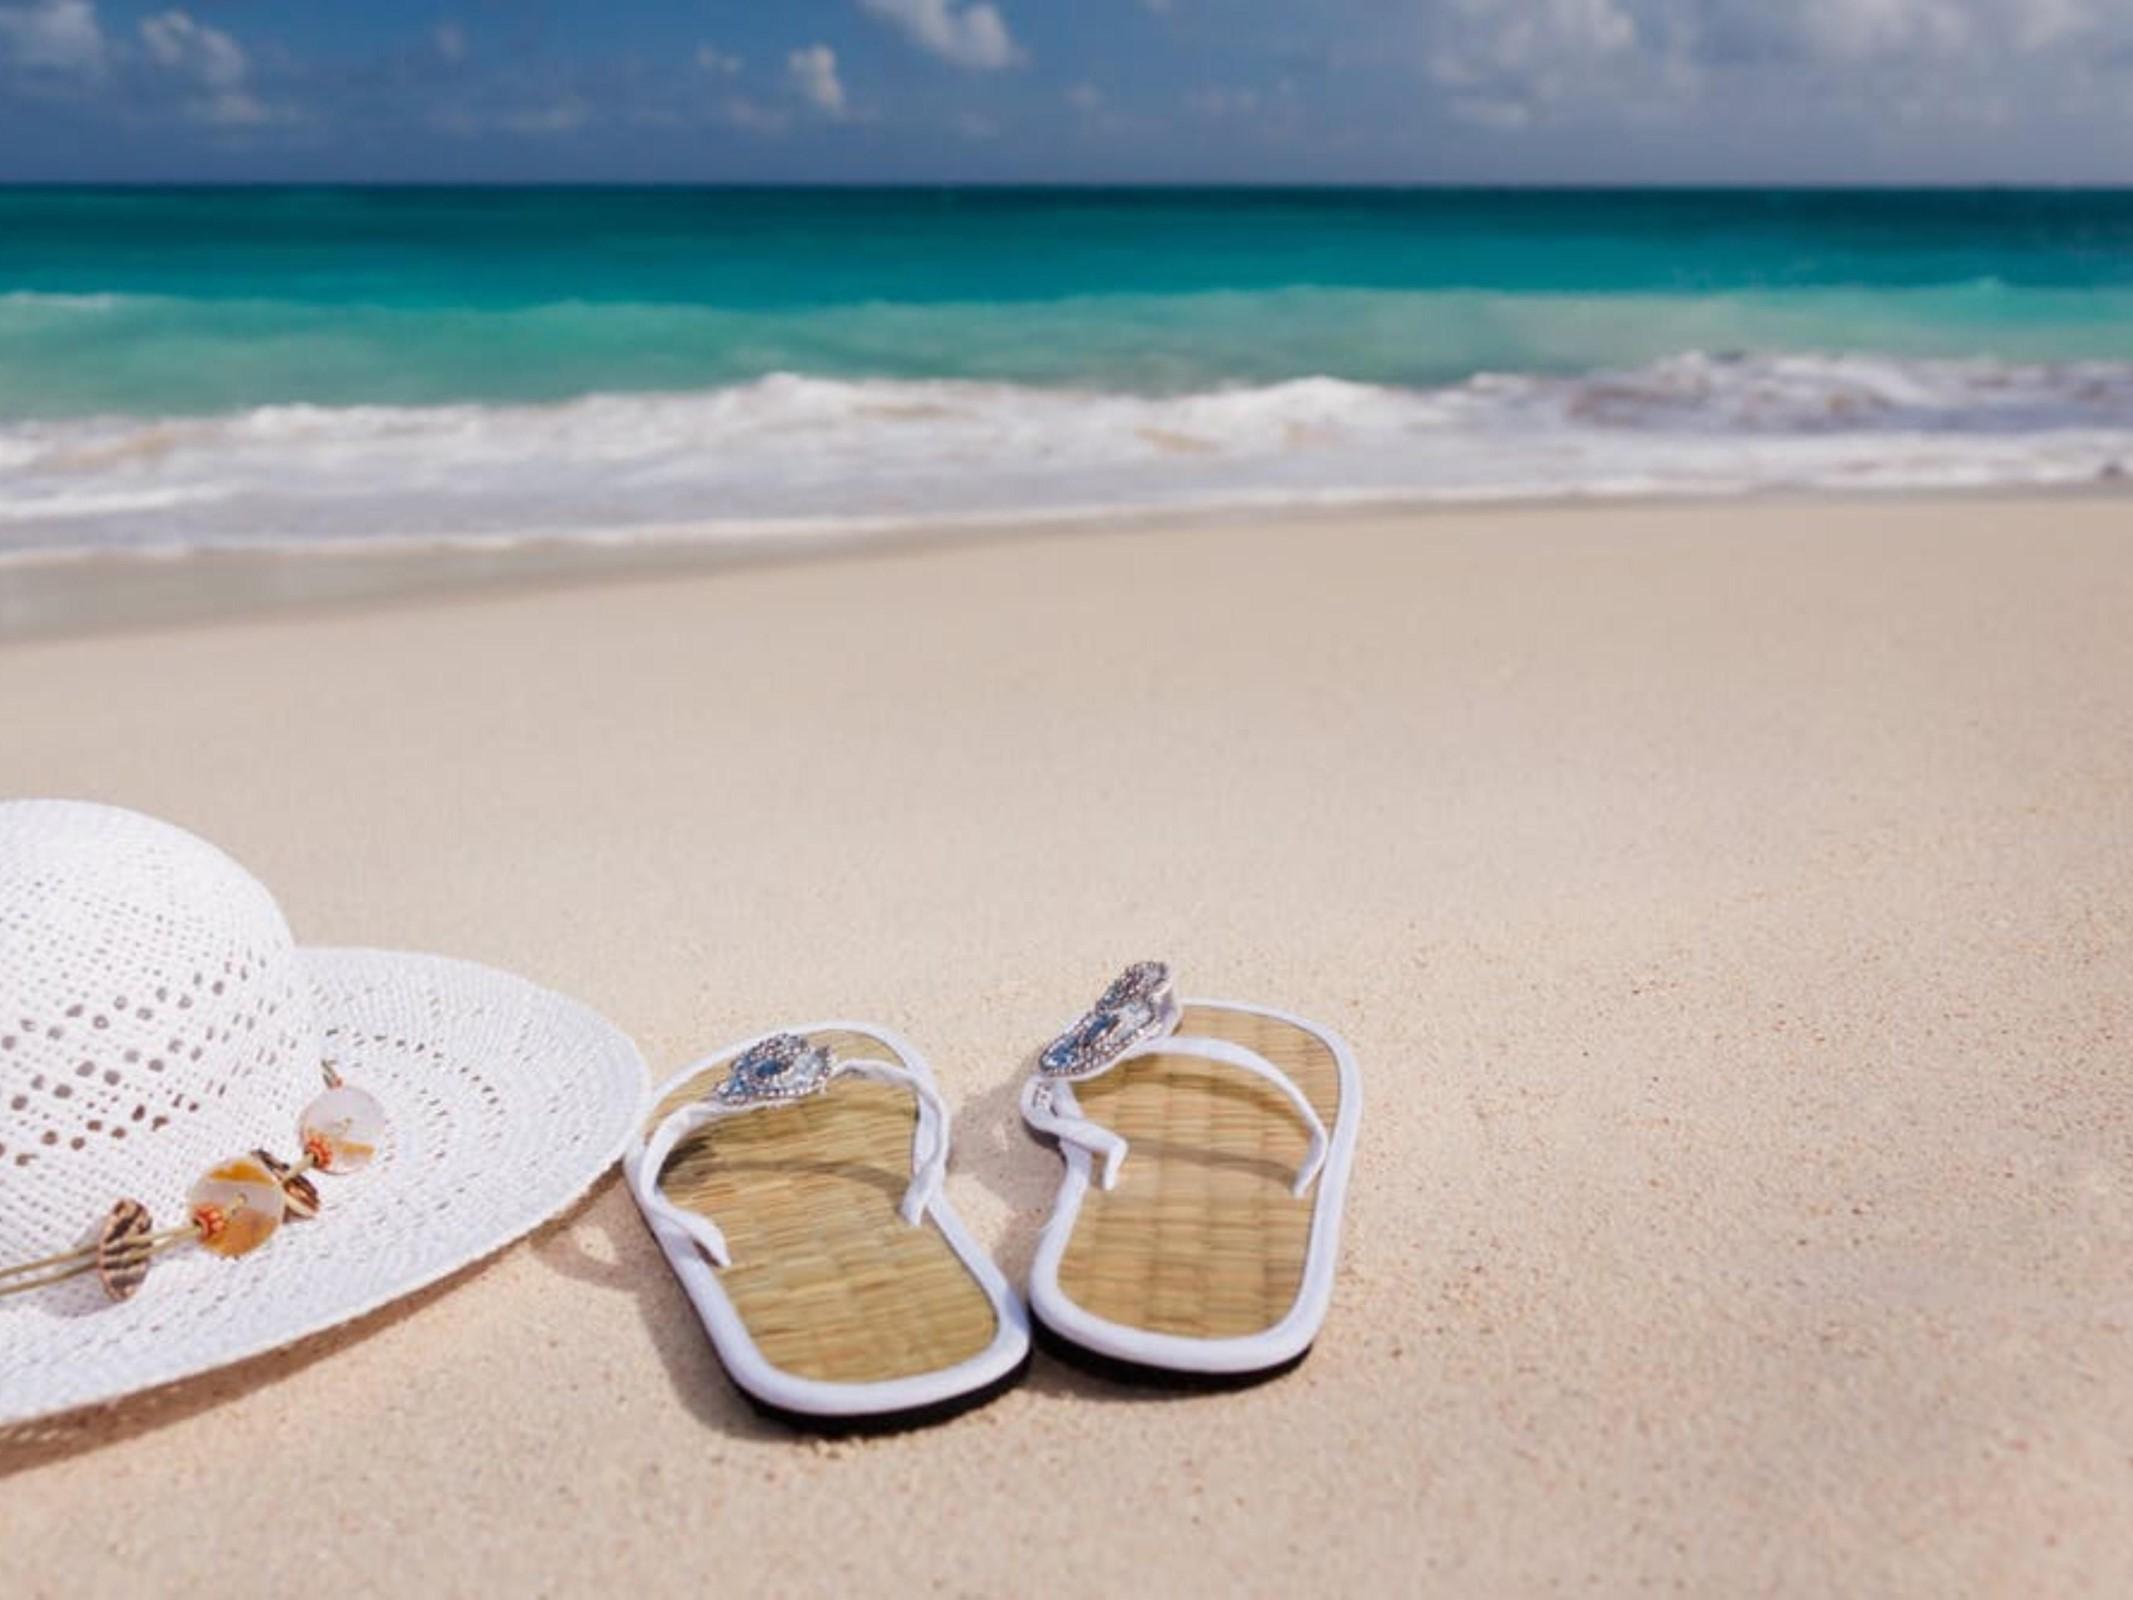 Sandals and sun hat on a sandy beach